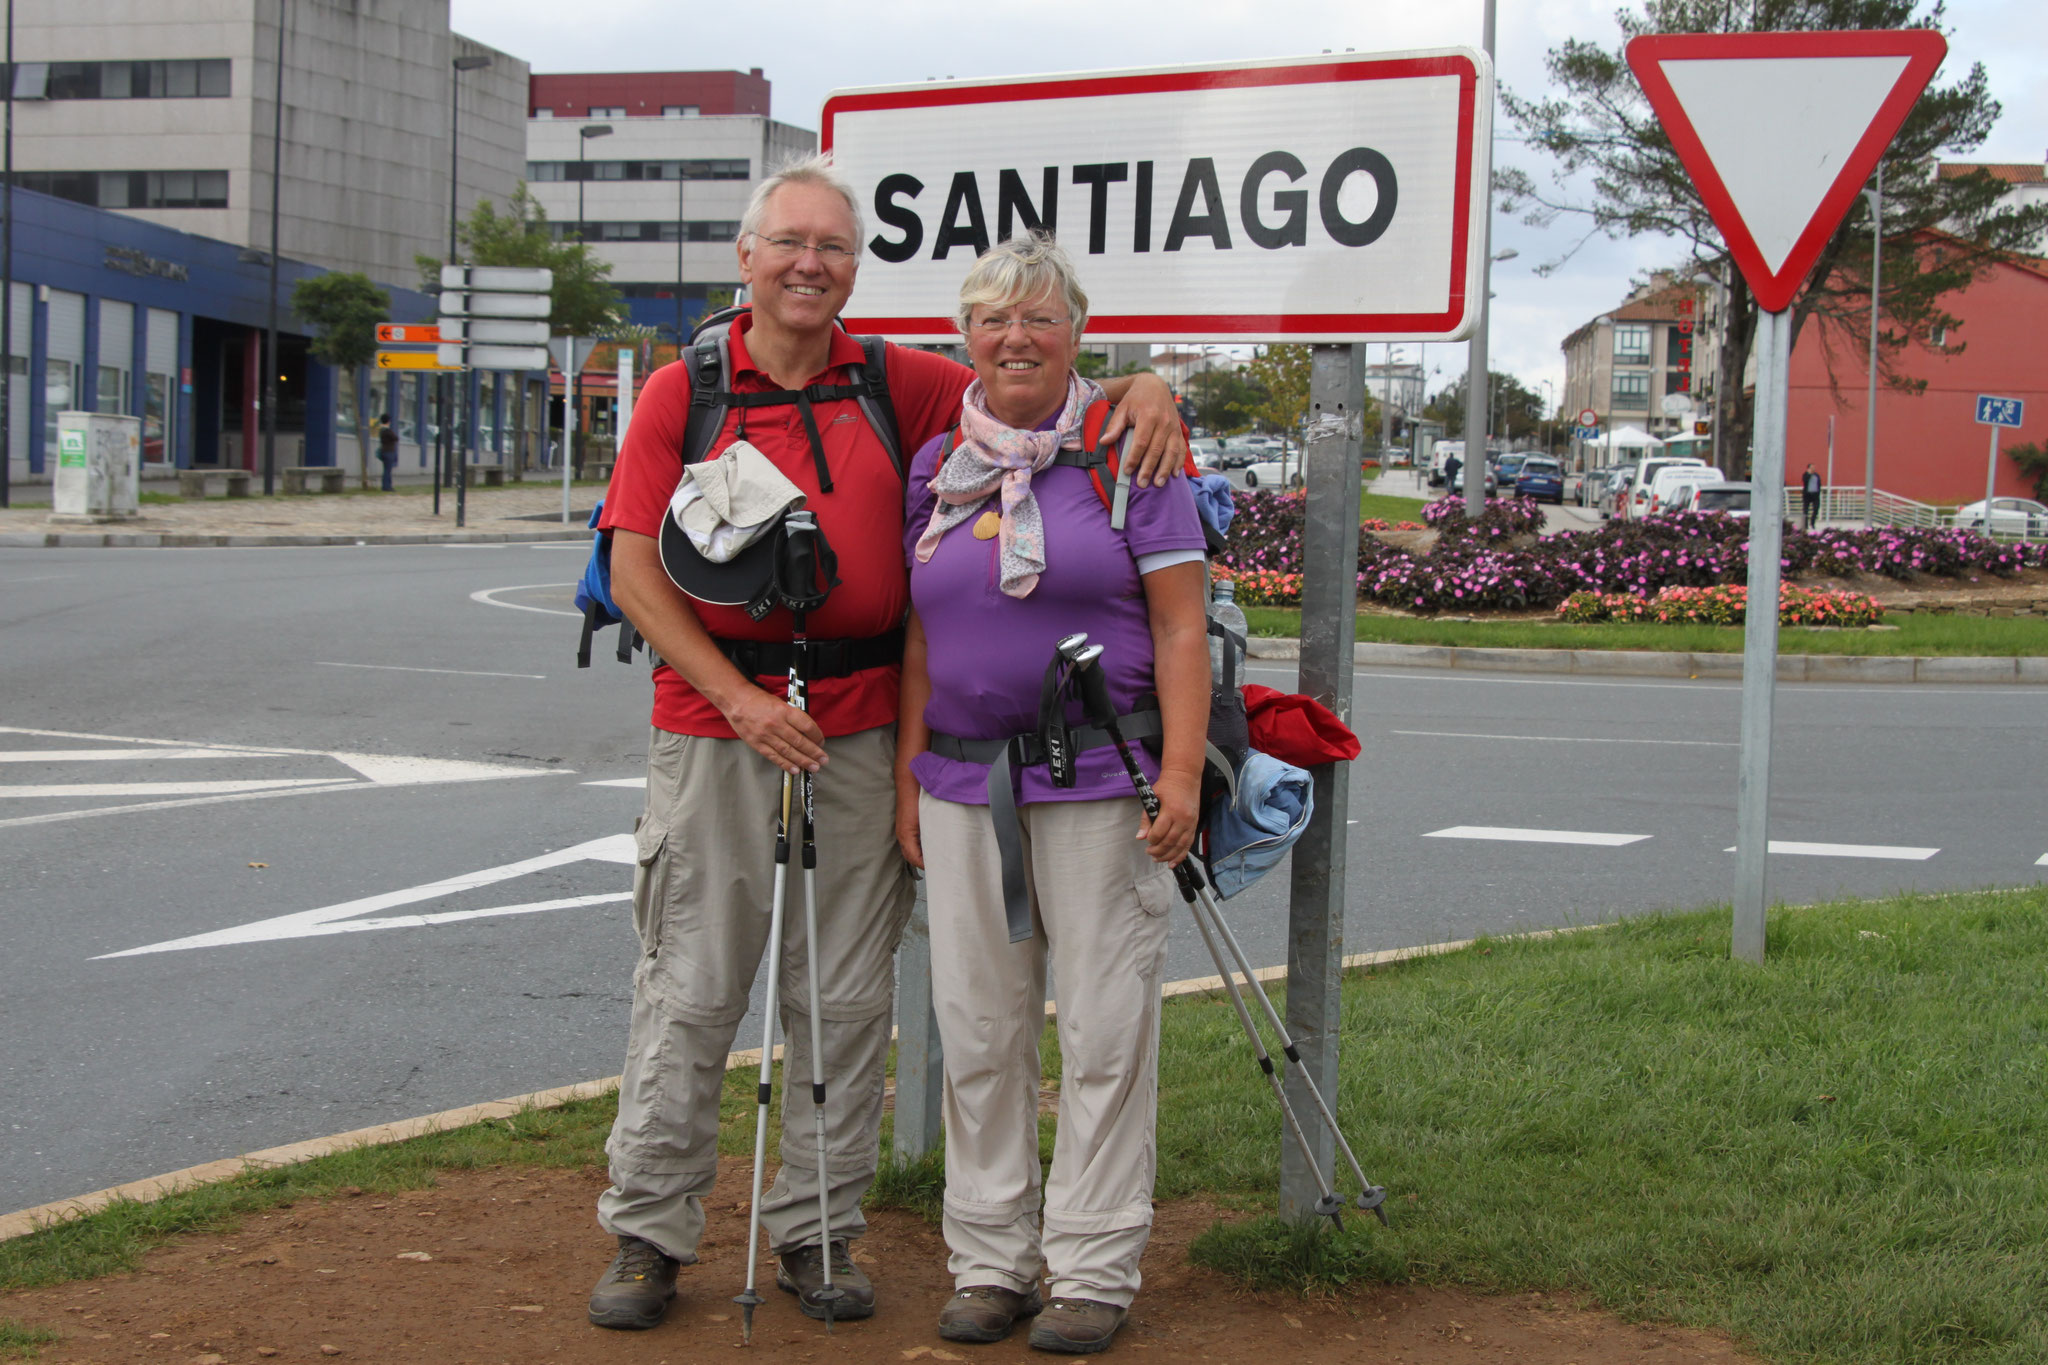 Ankunft in Santiago de Compostela